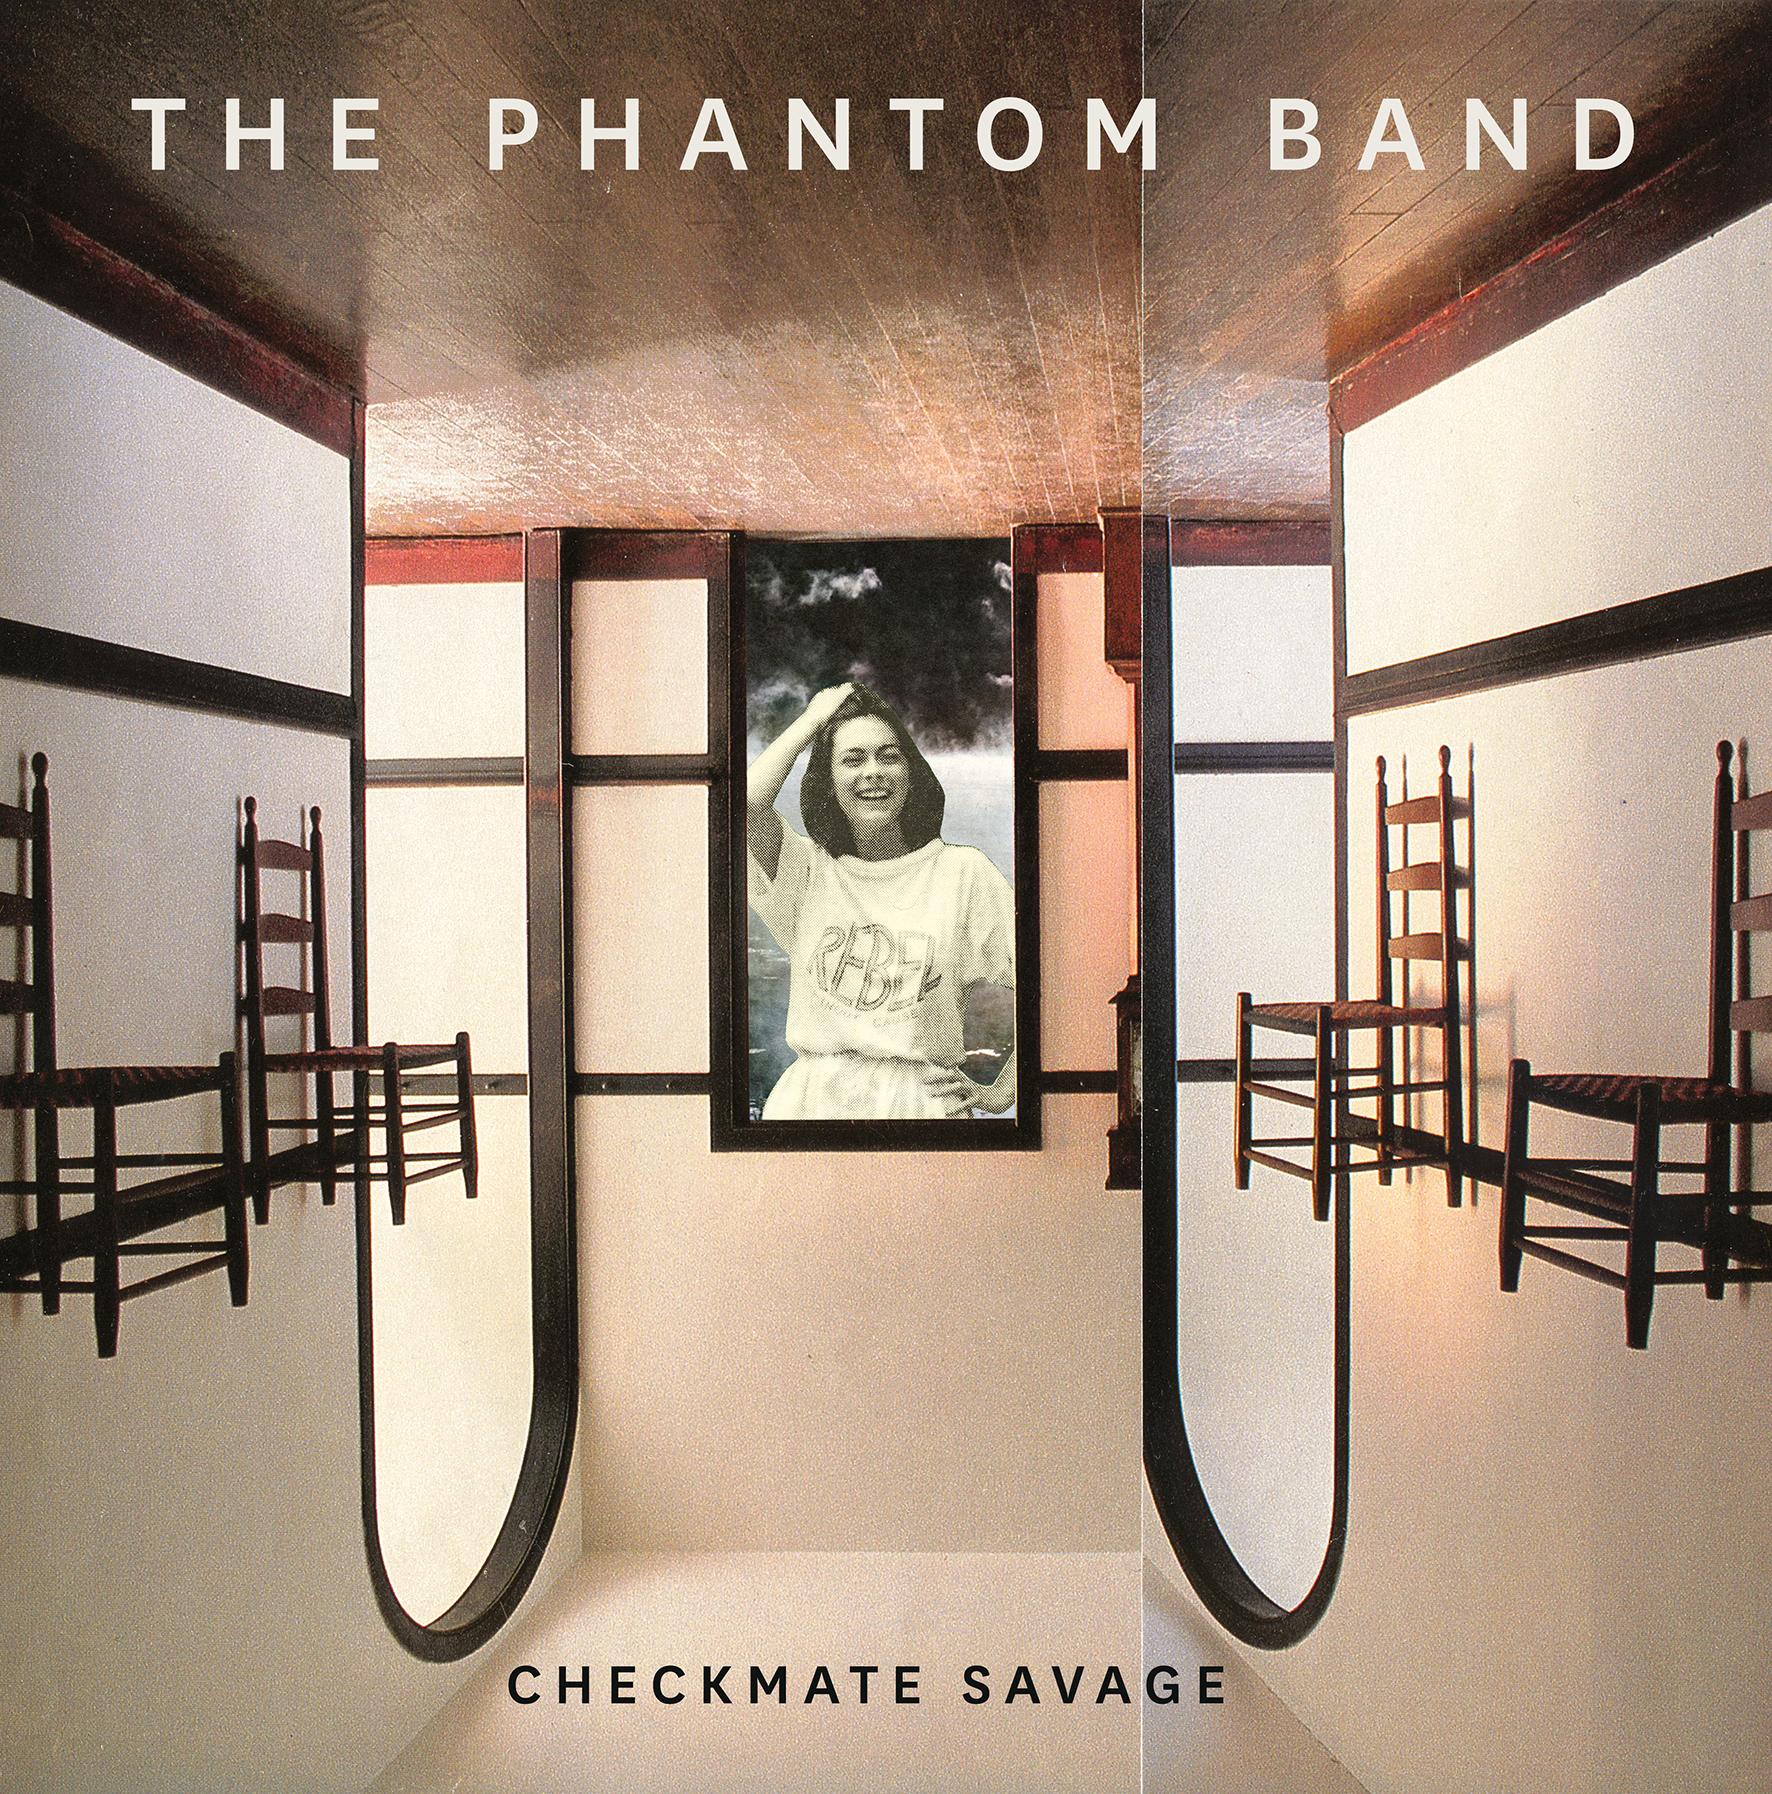 The Phantom Band - Checkmate Savage - Reissue 2LP Vinyl (2019) - The Phantom Band